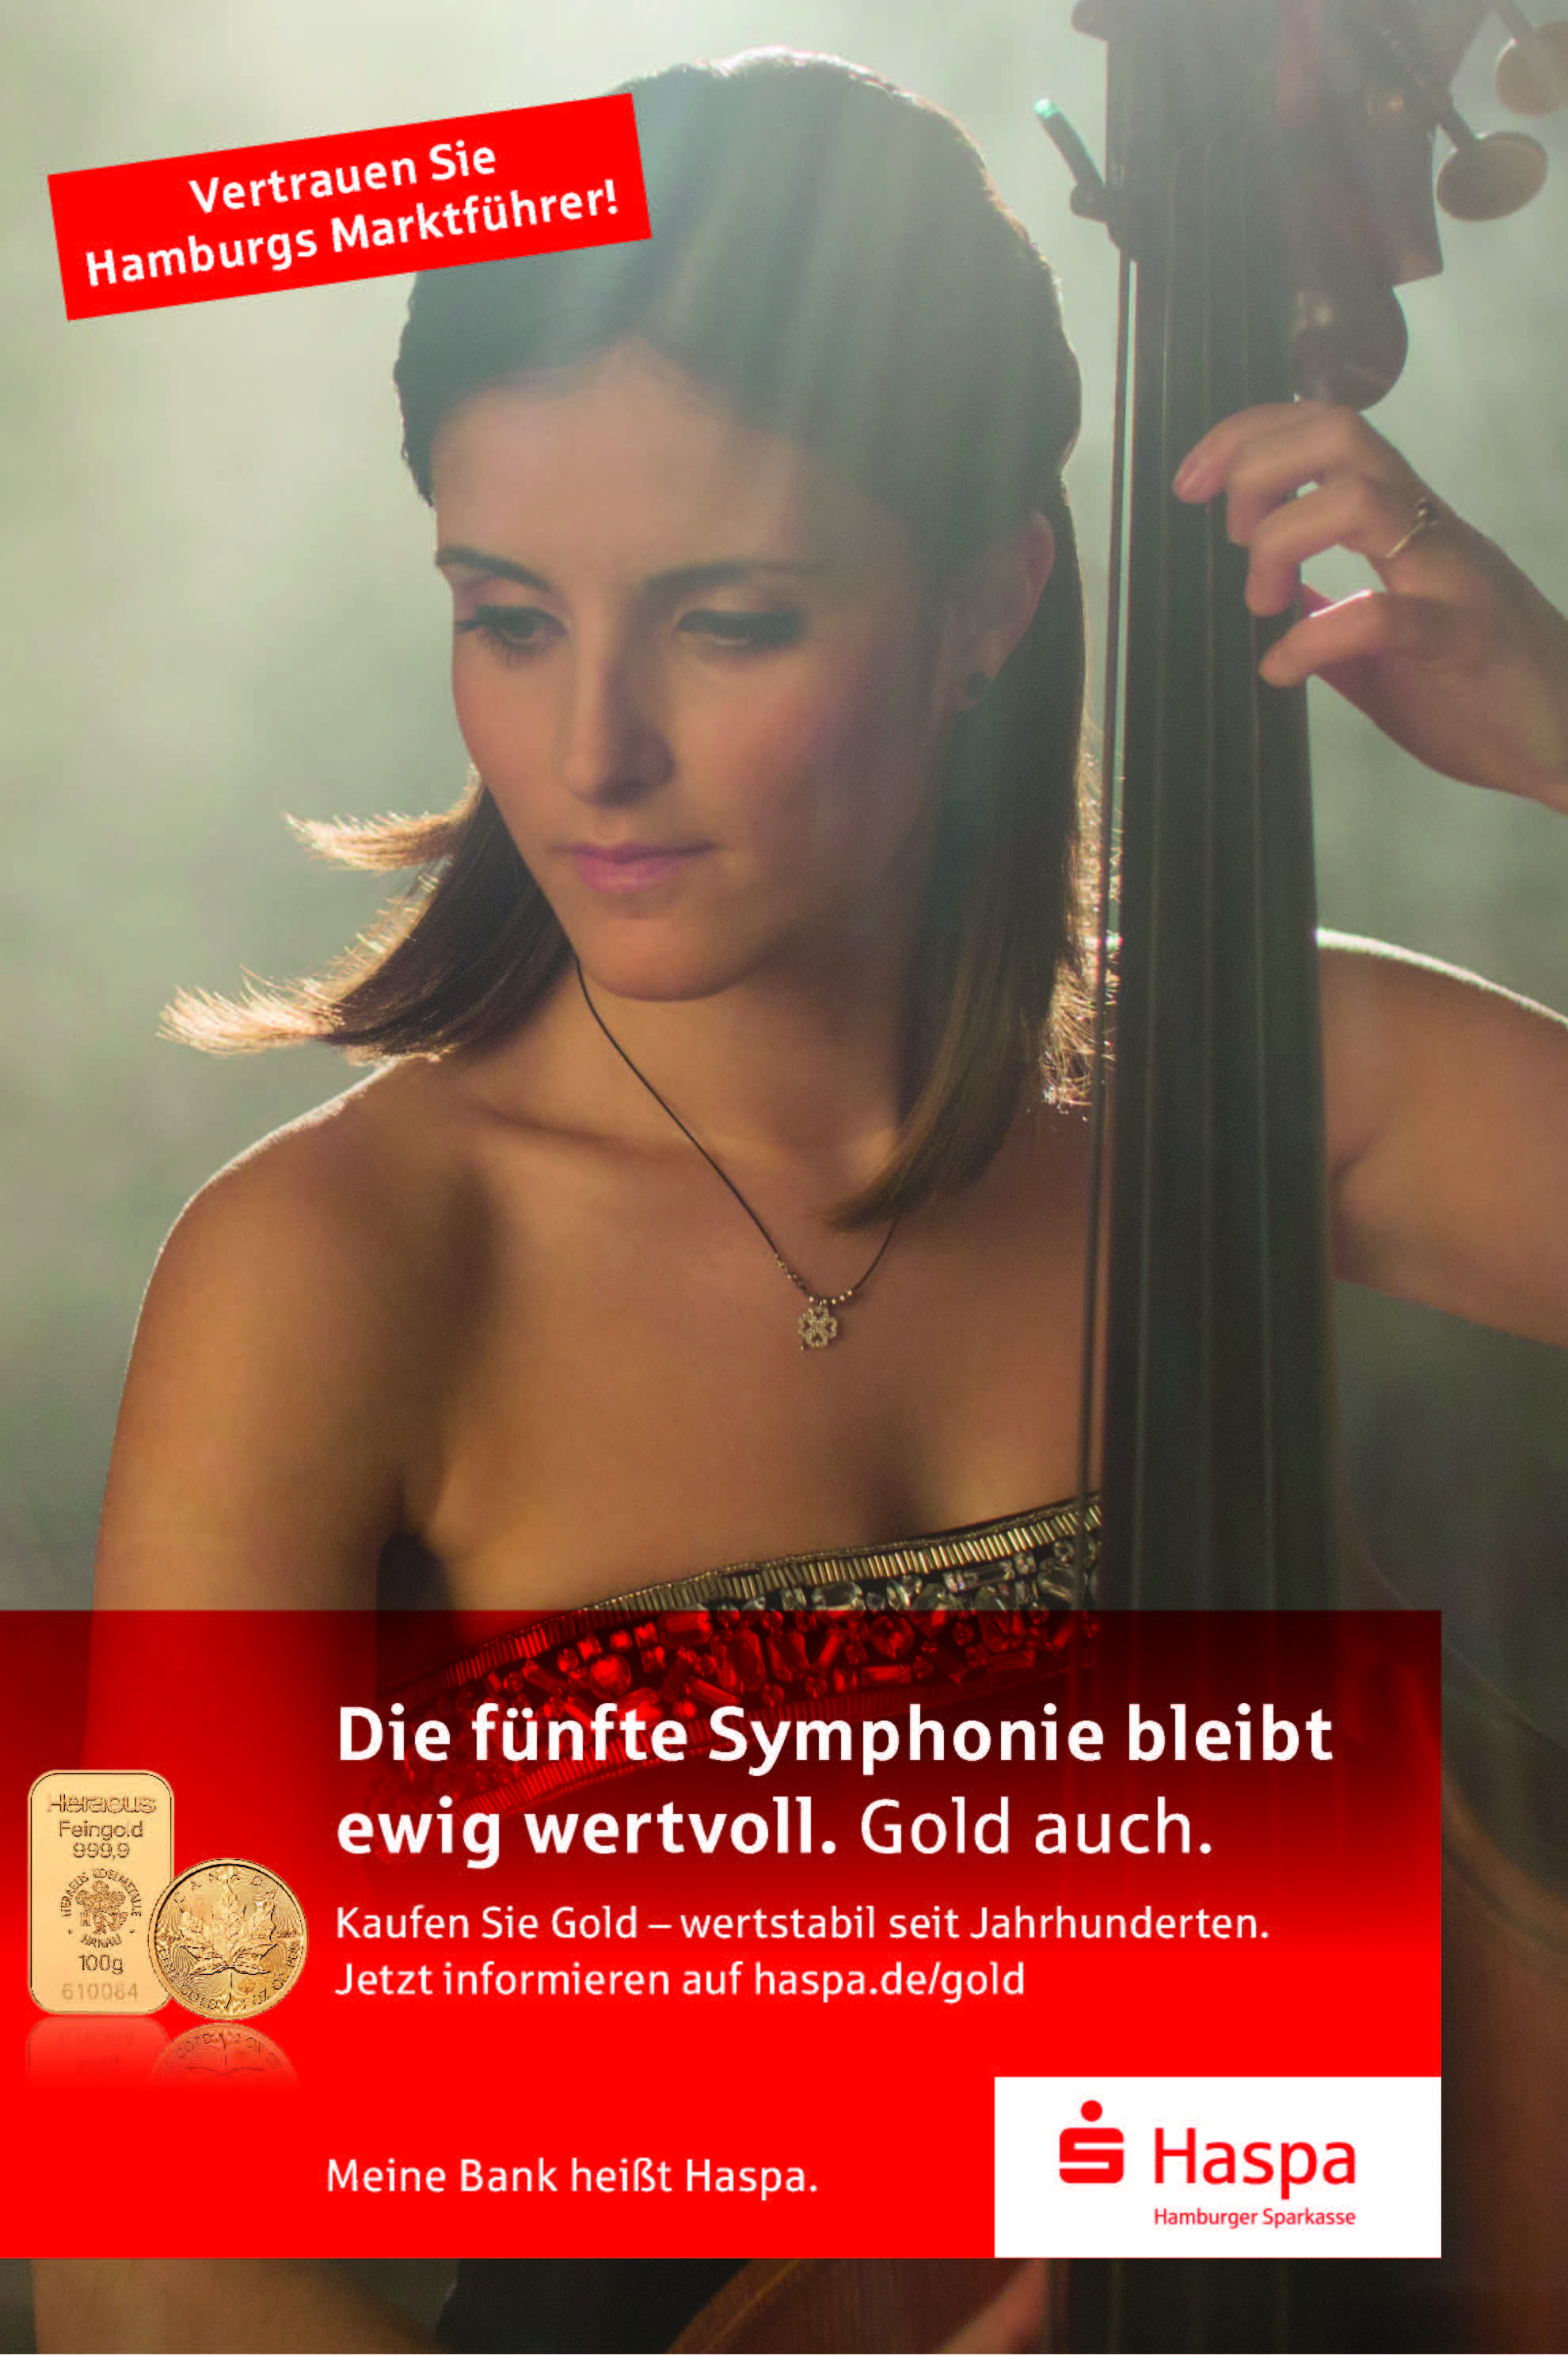 161213_LY_Haspa_Gold_Kloenschnack_Seite_1.jpg